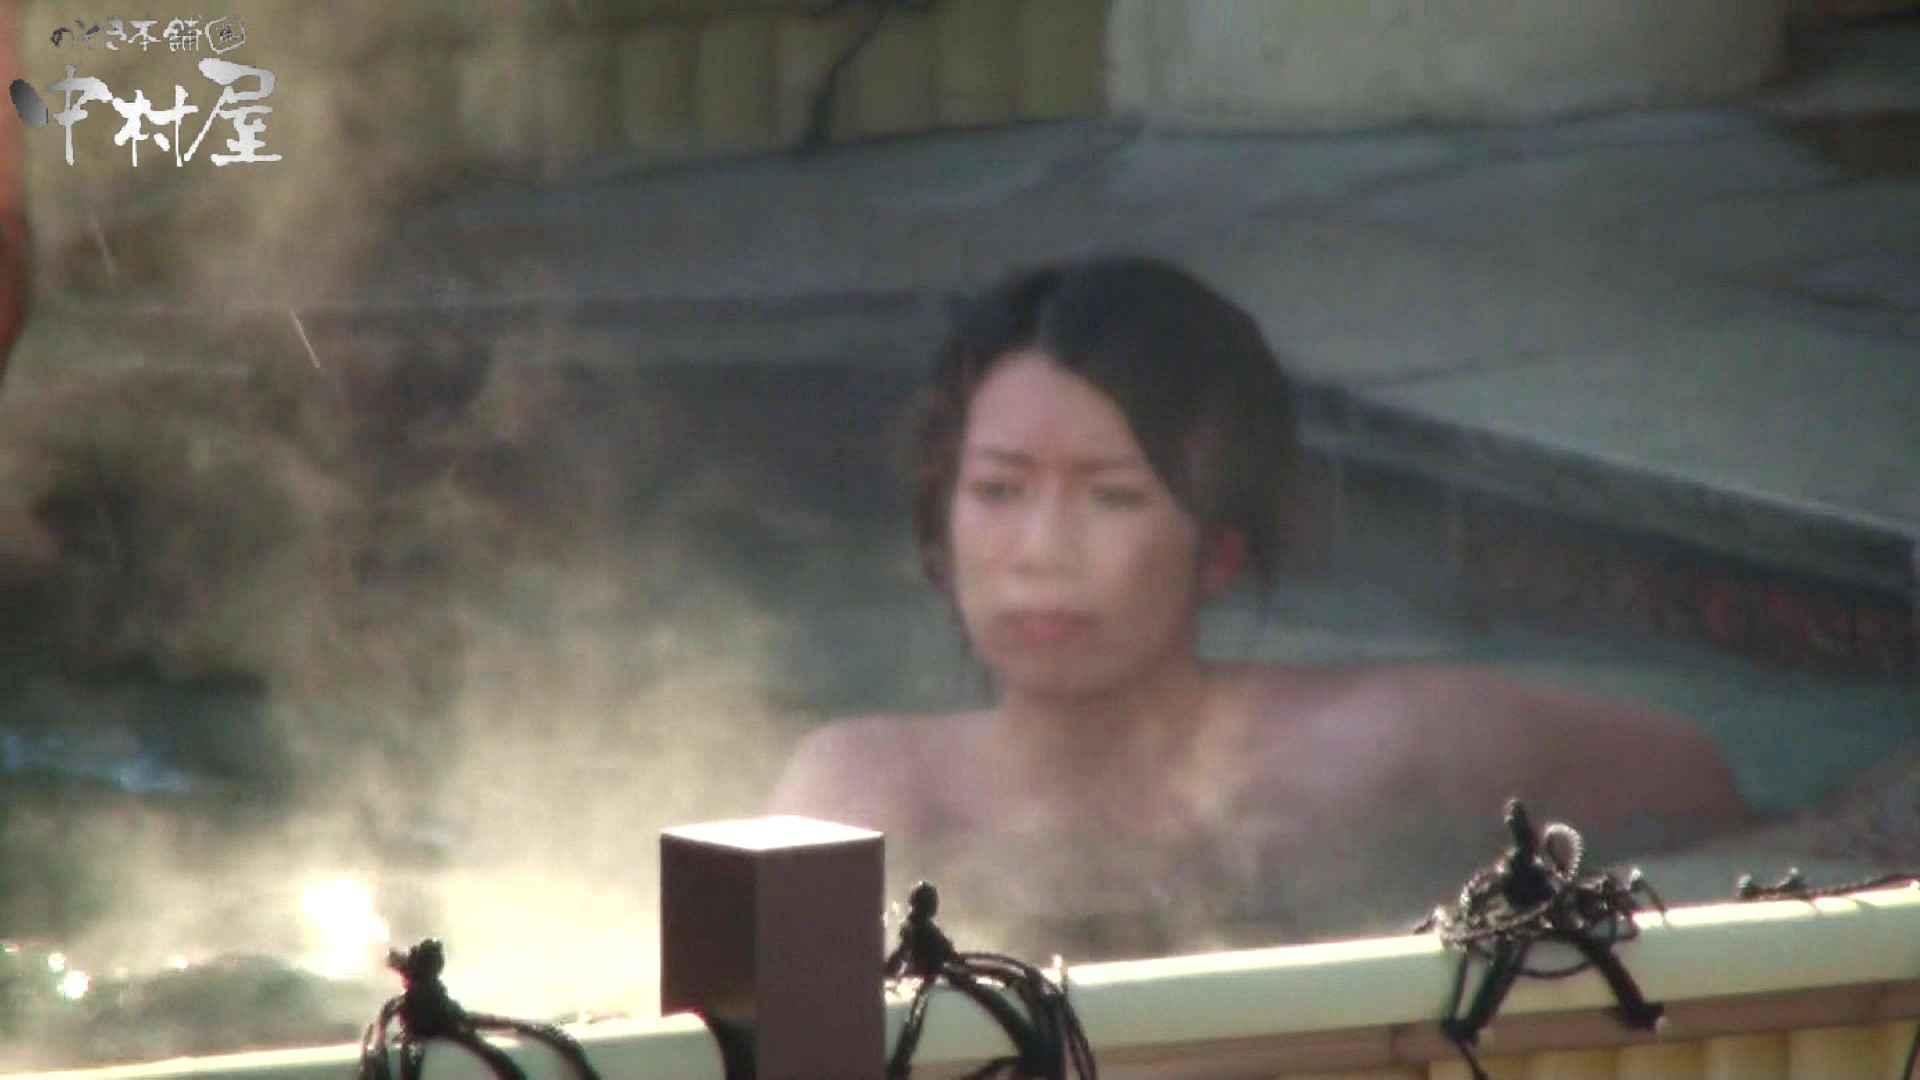 Aquaな露天風呂Vol.919 盗撮 おまんこ無修正動画無料 91連発 65